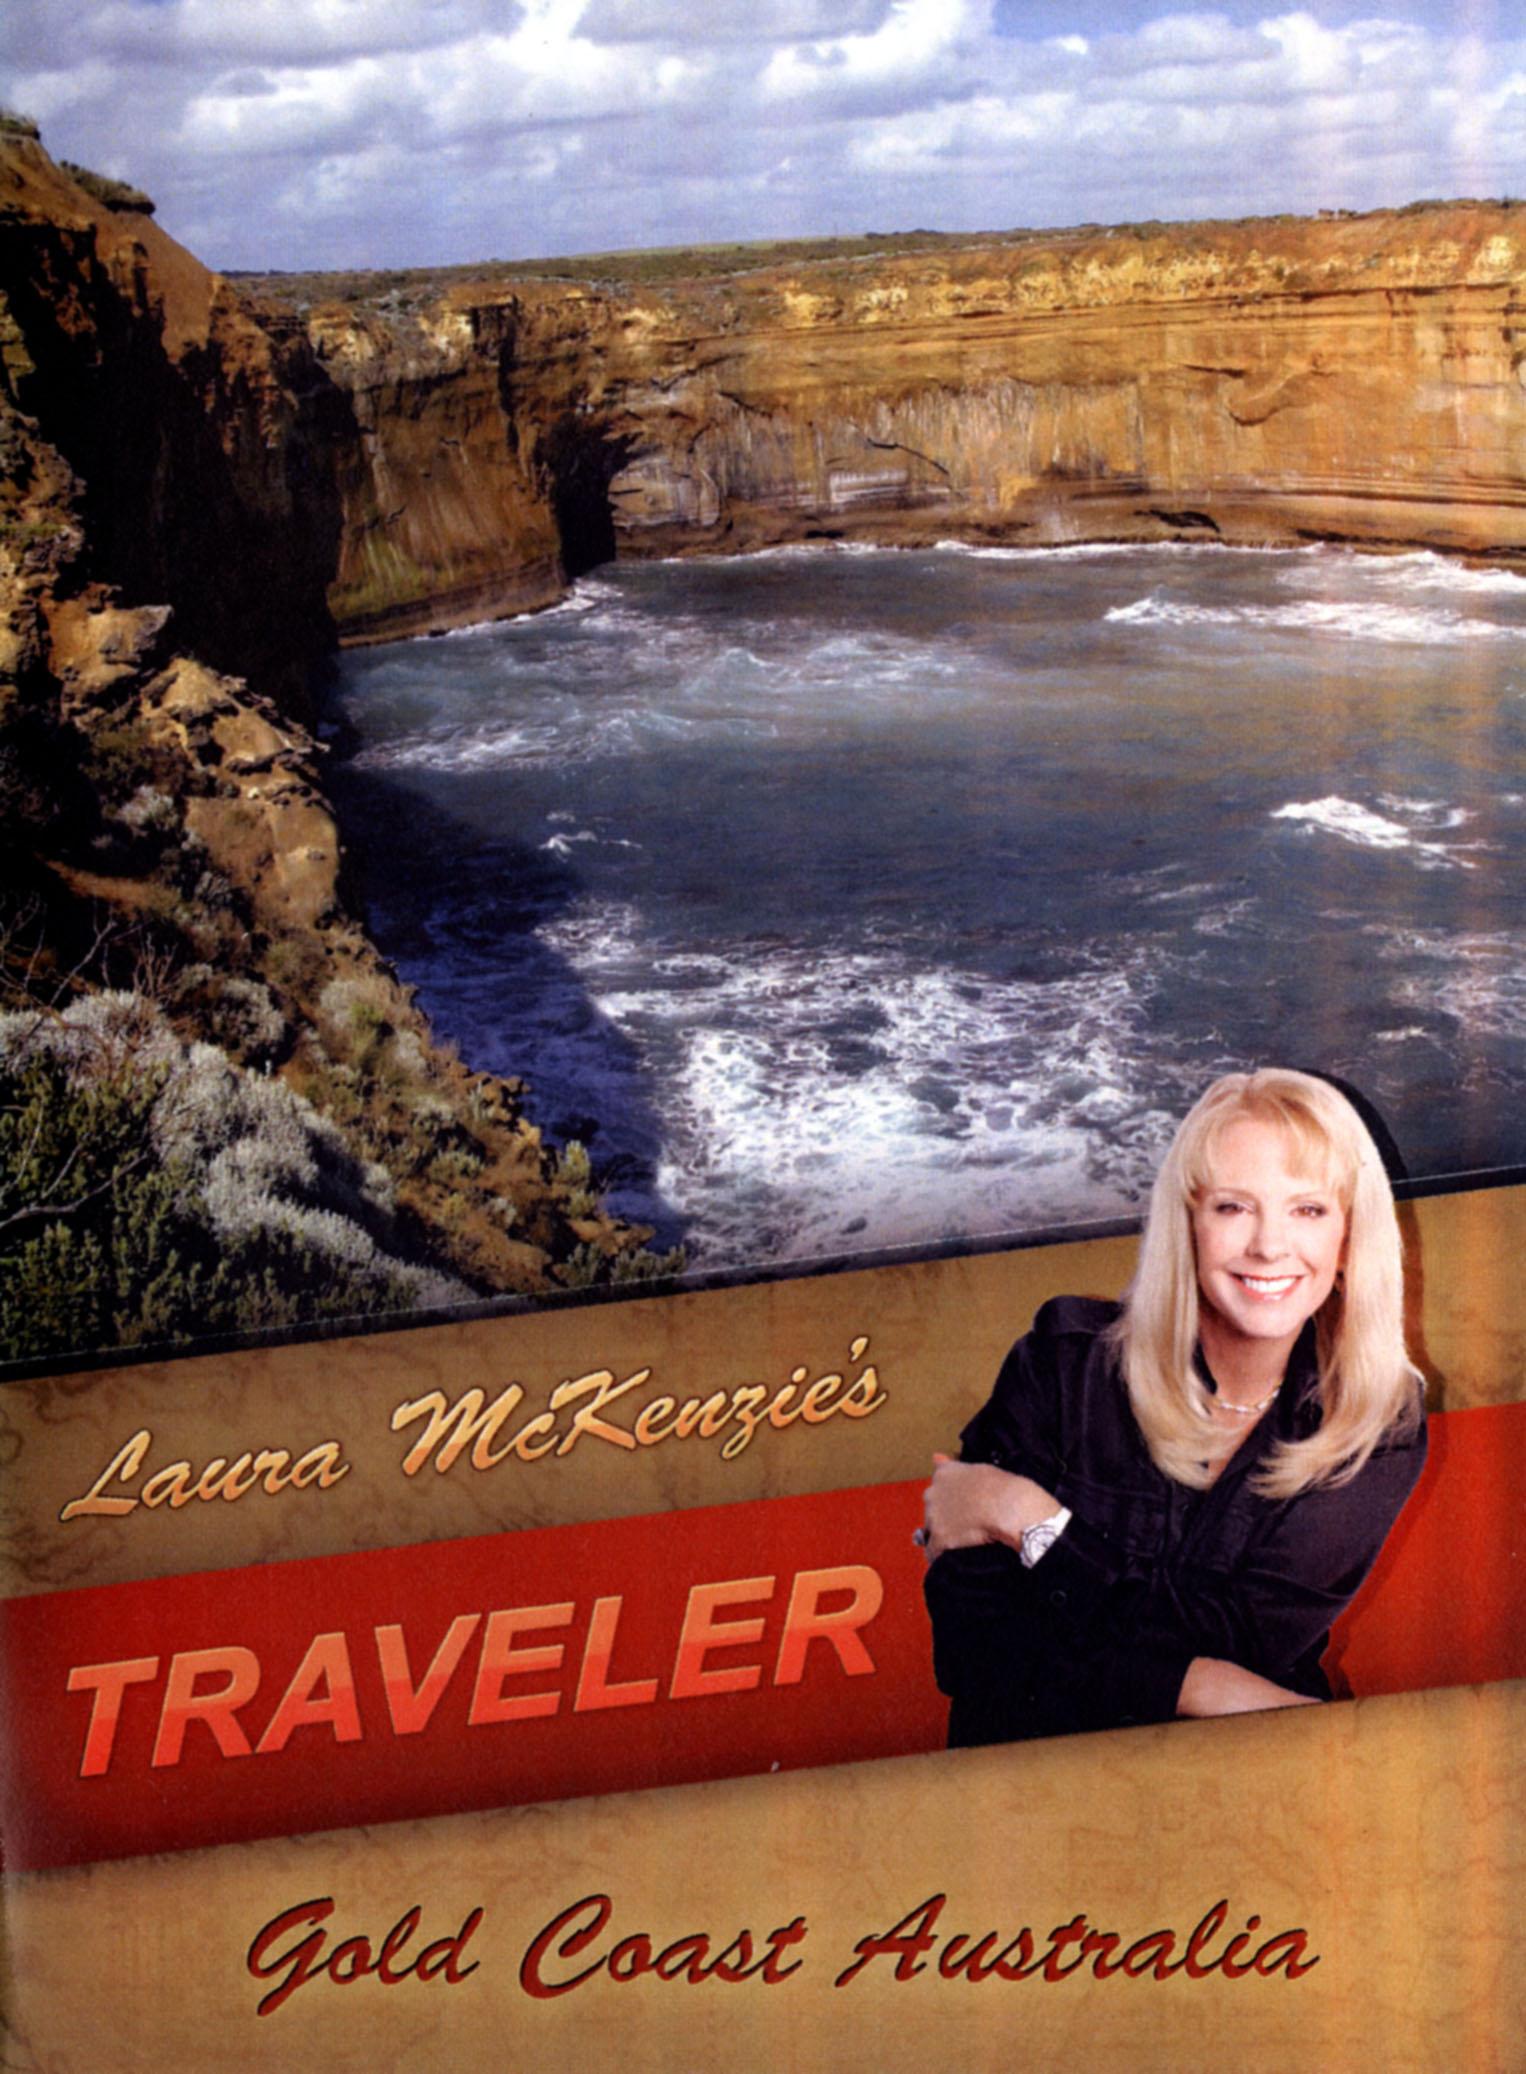 Laura McKenzie's Traveler: Gold Coast Australia